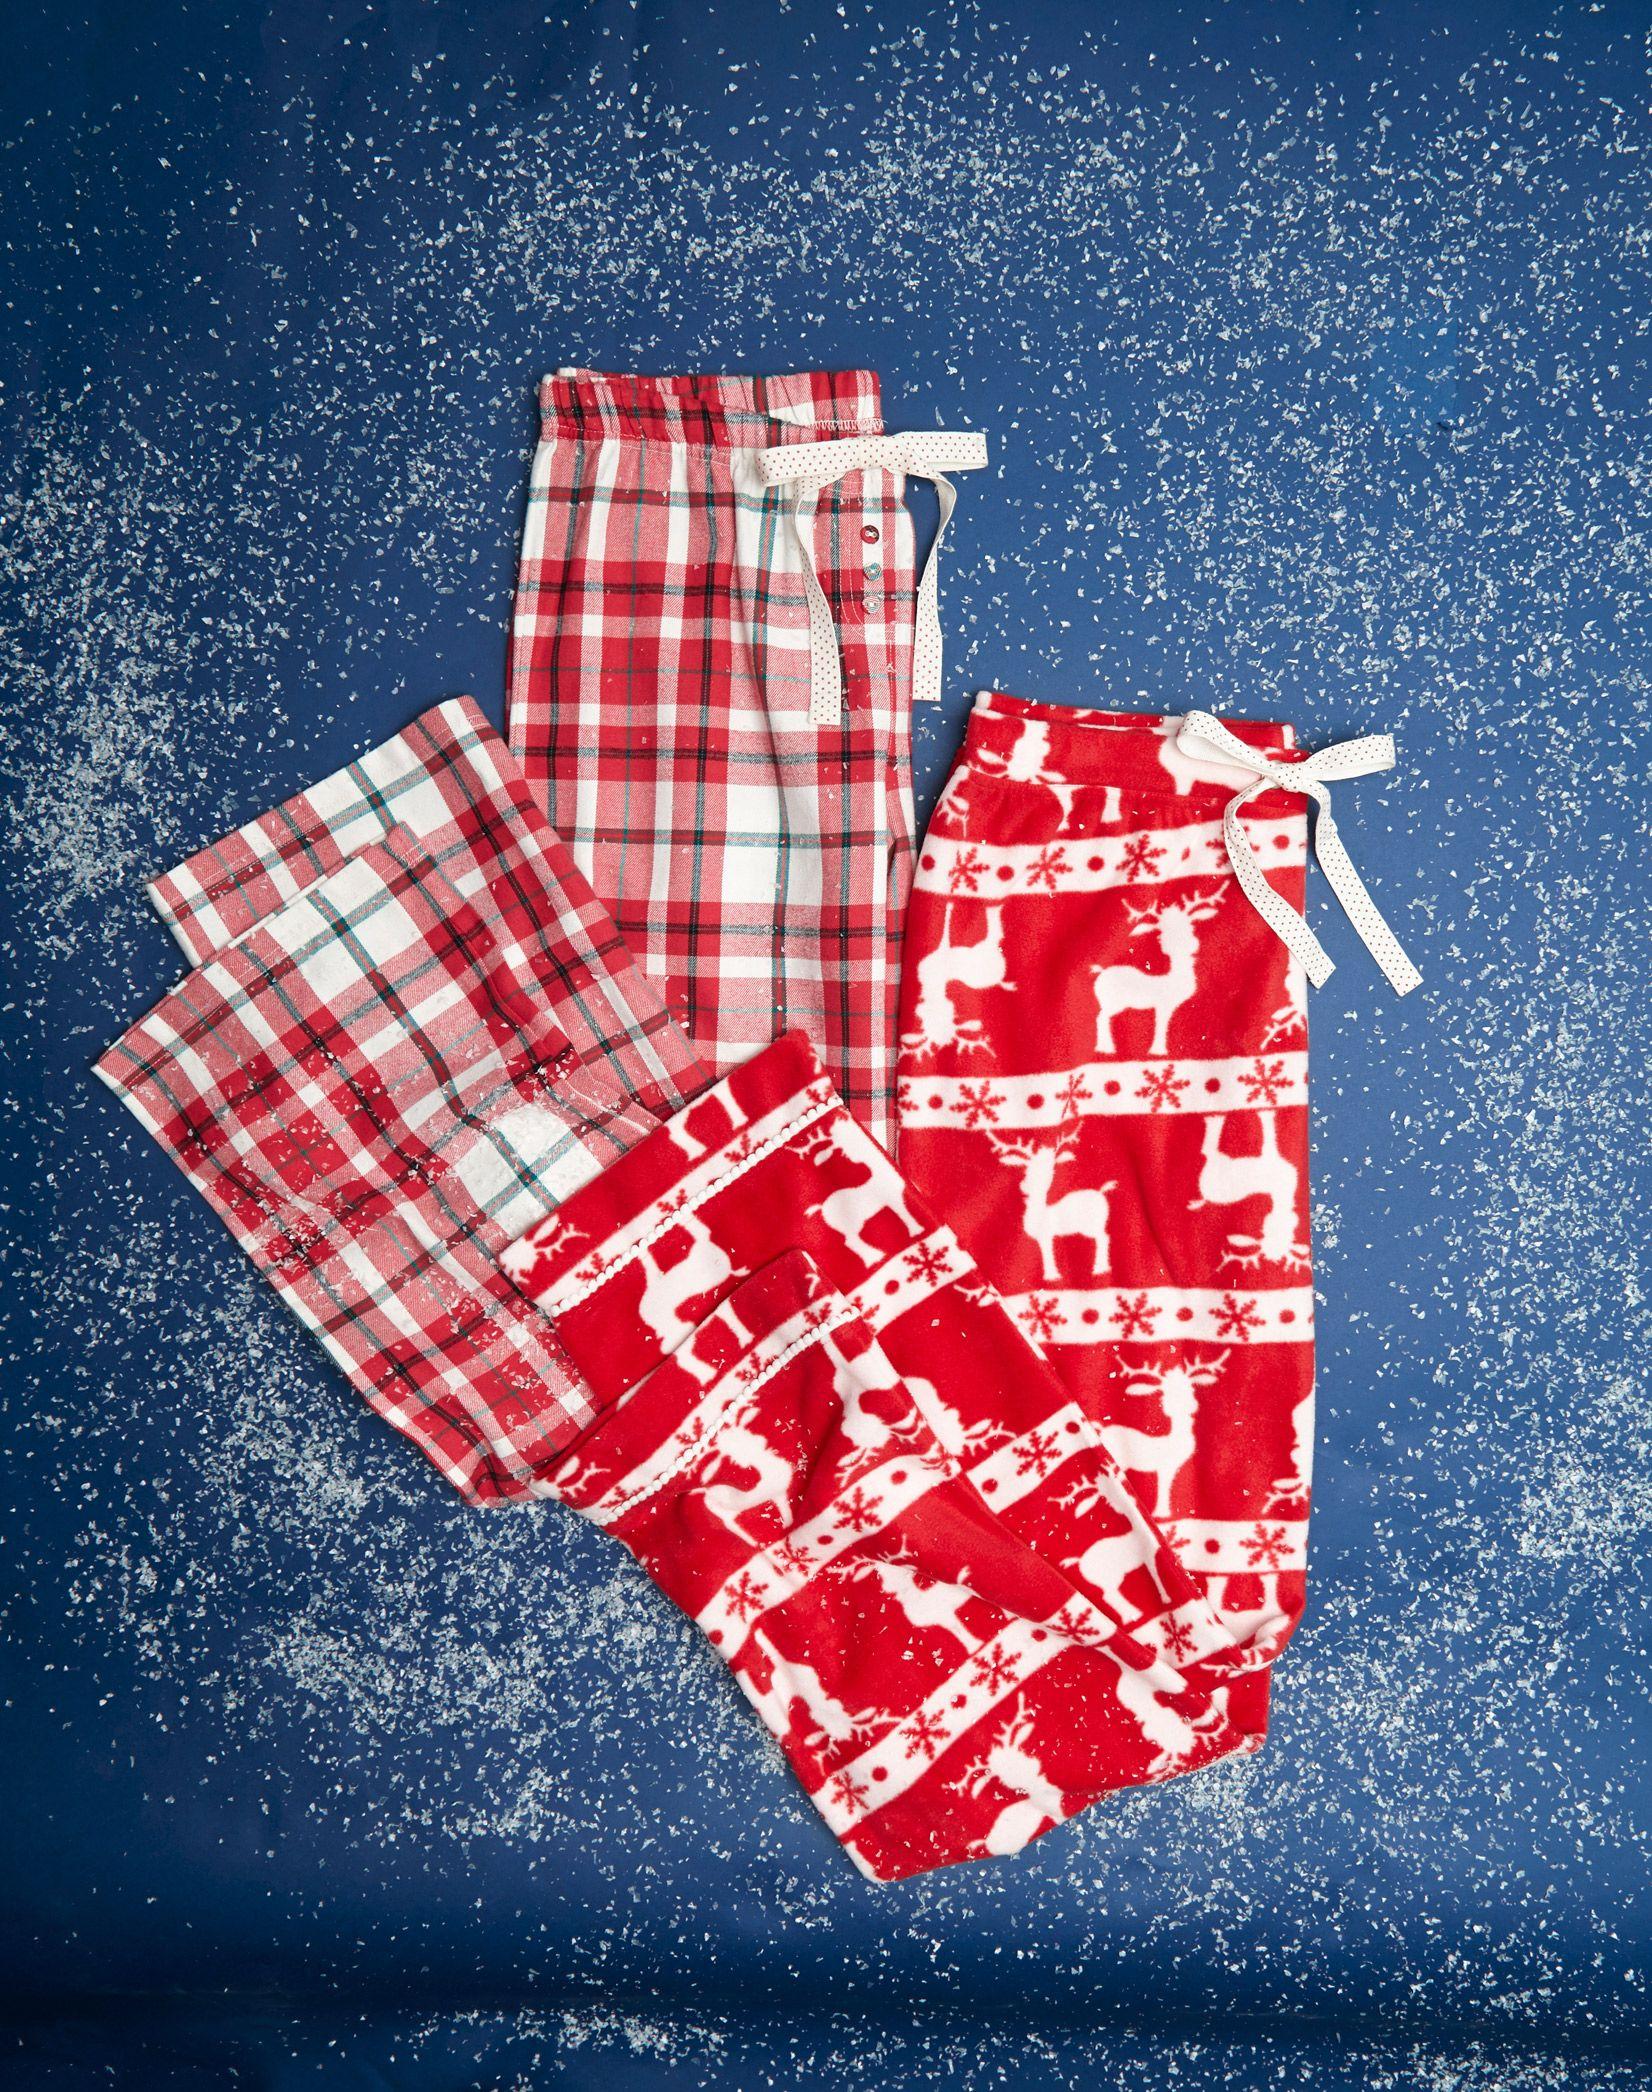 Make it warm this Christmas with snug pyjamas in Christmas